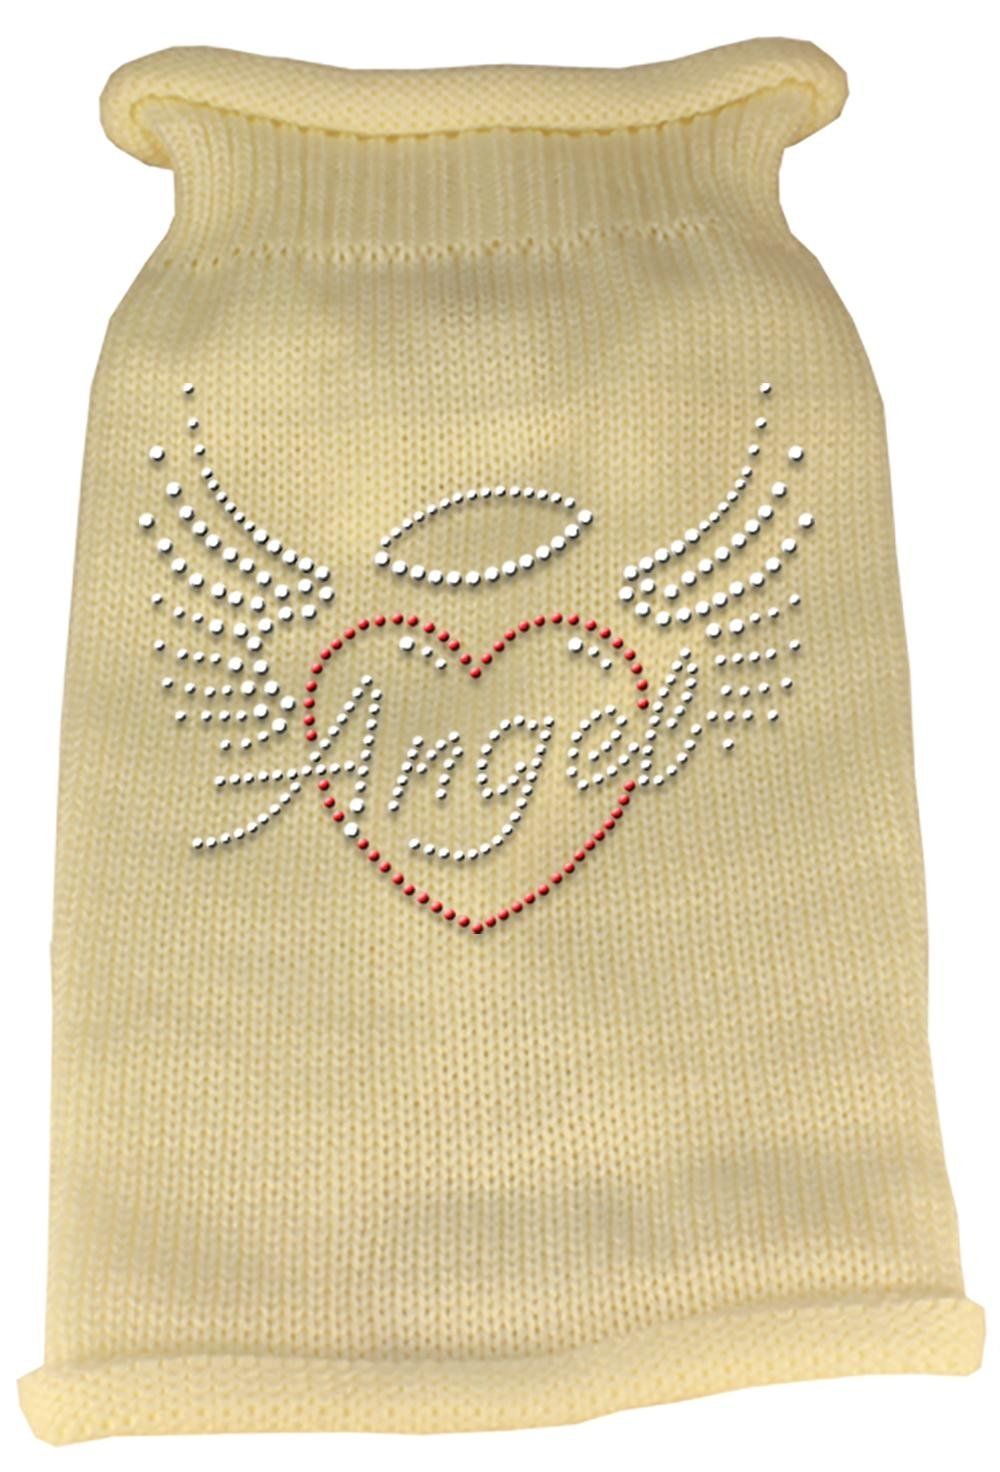 Cream Small Cream Small Mirage Pet Products Angel Heart Rhinestone Knit Pet Sweater, Small, Cream